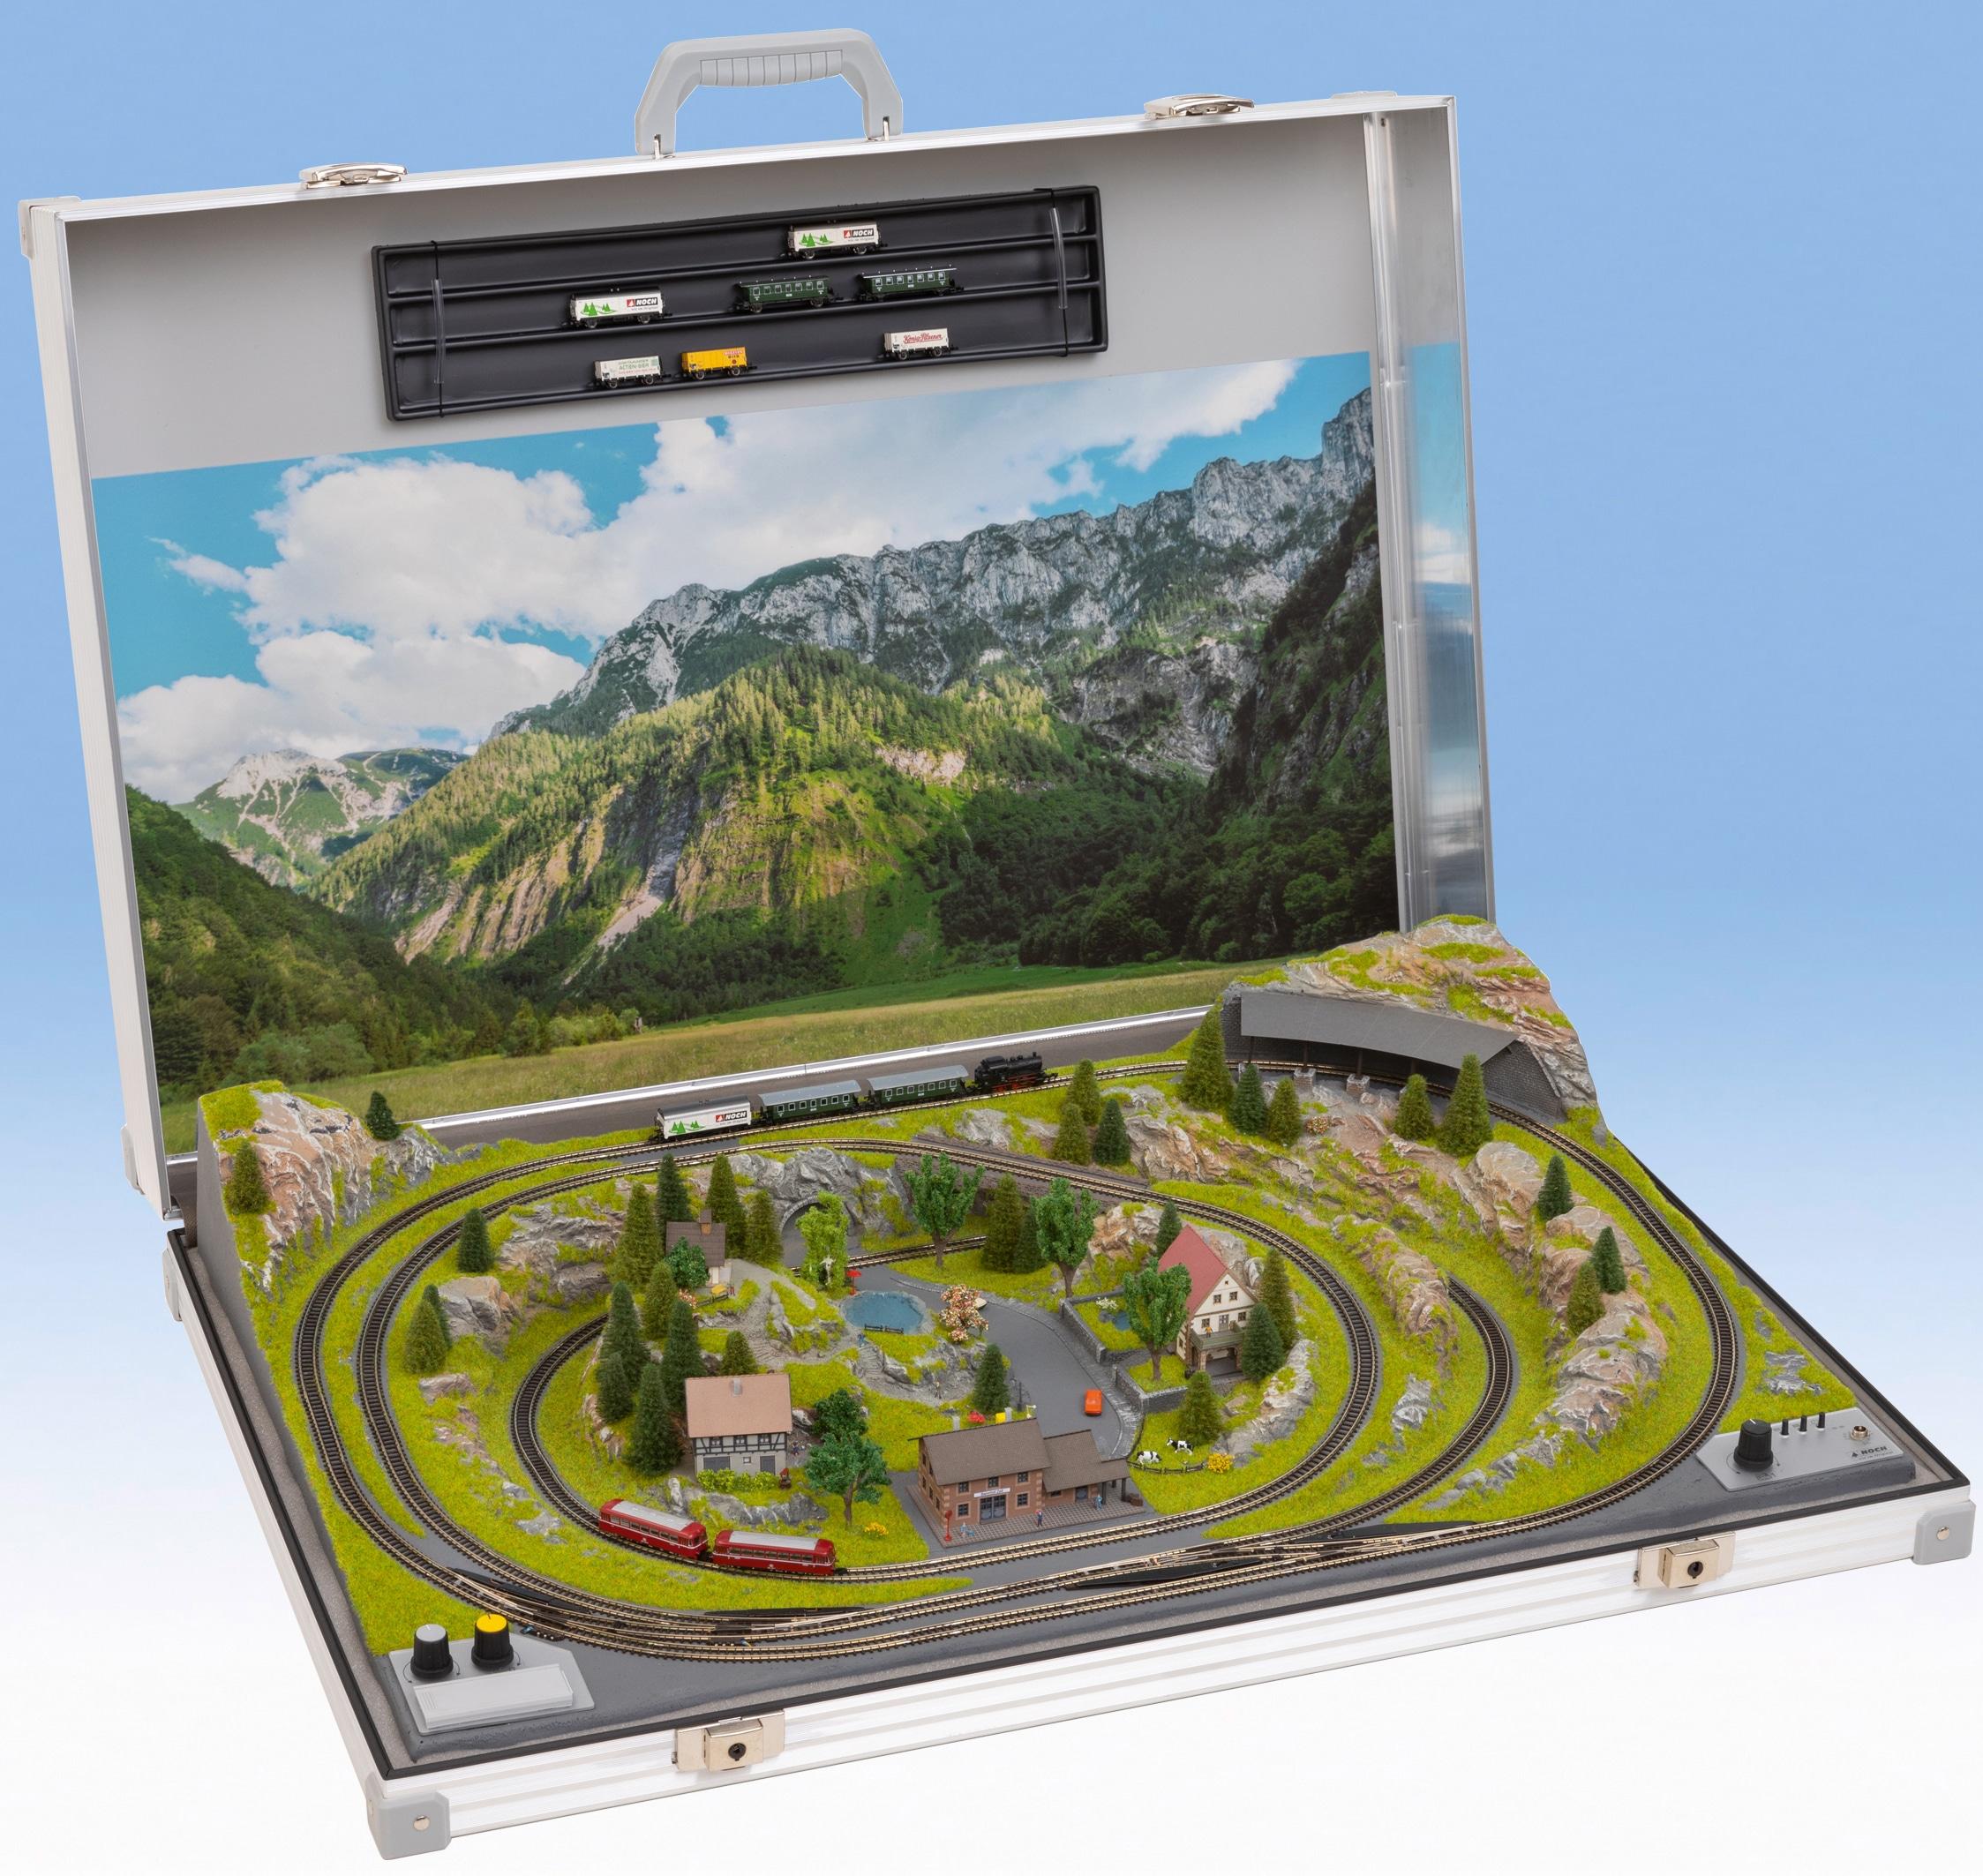 NOCH Modelleisenbahn-Set Modellbahnkoffer Meran, Made in Germany silberfarben Kinder Modelleisenbahn-Sets Modelleisenbahnen Autos, Eisenbahn Modellbau